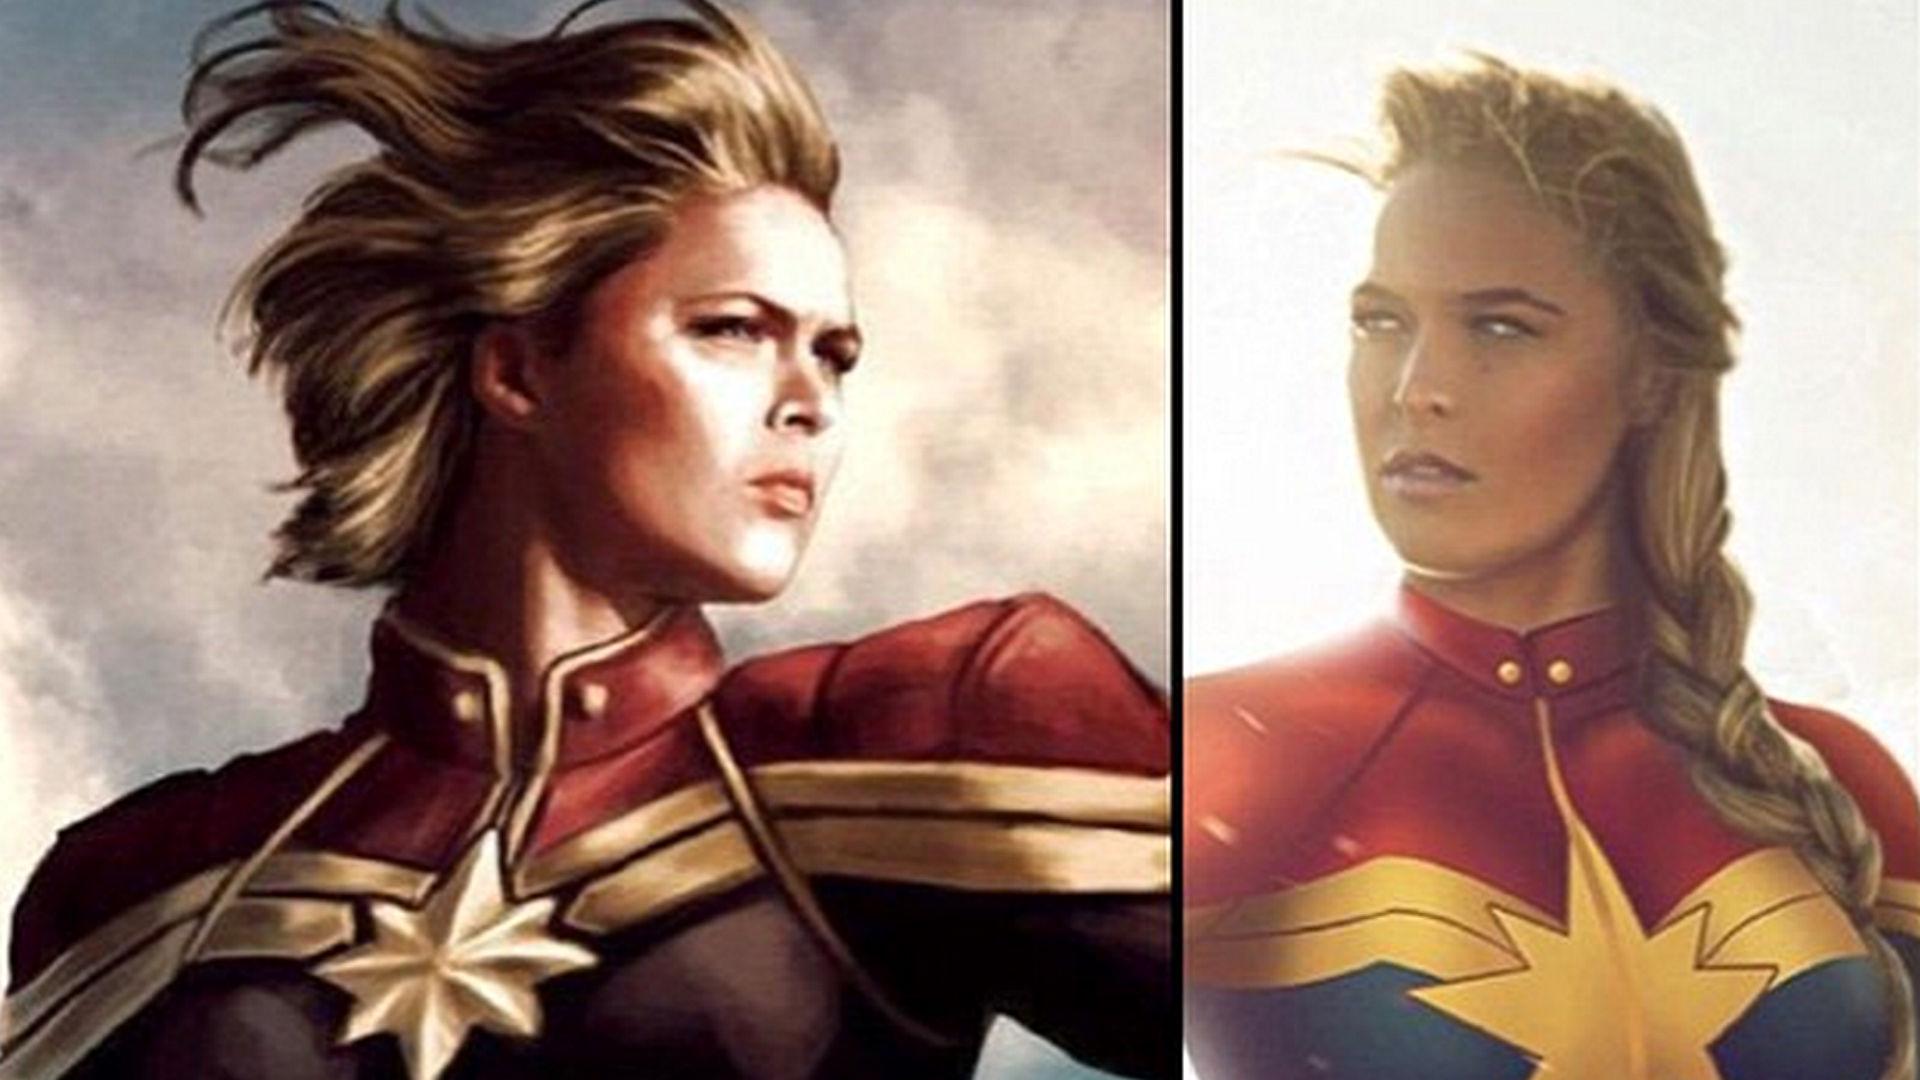 ronda-rousey-superhero-081615-usnews-instagram-ftr